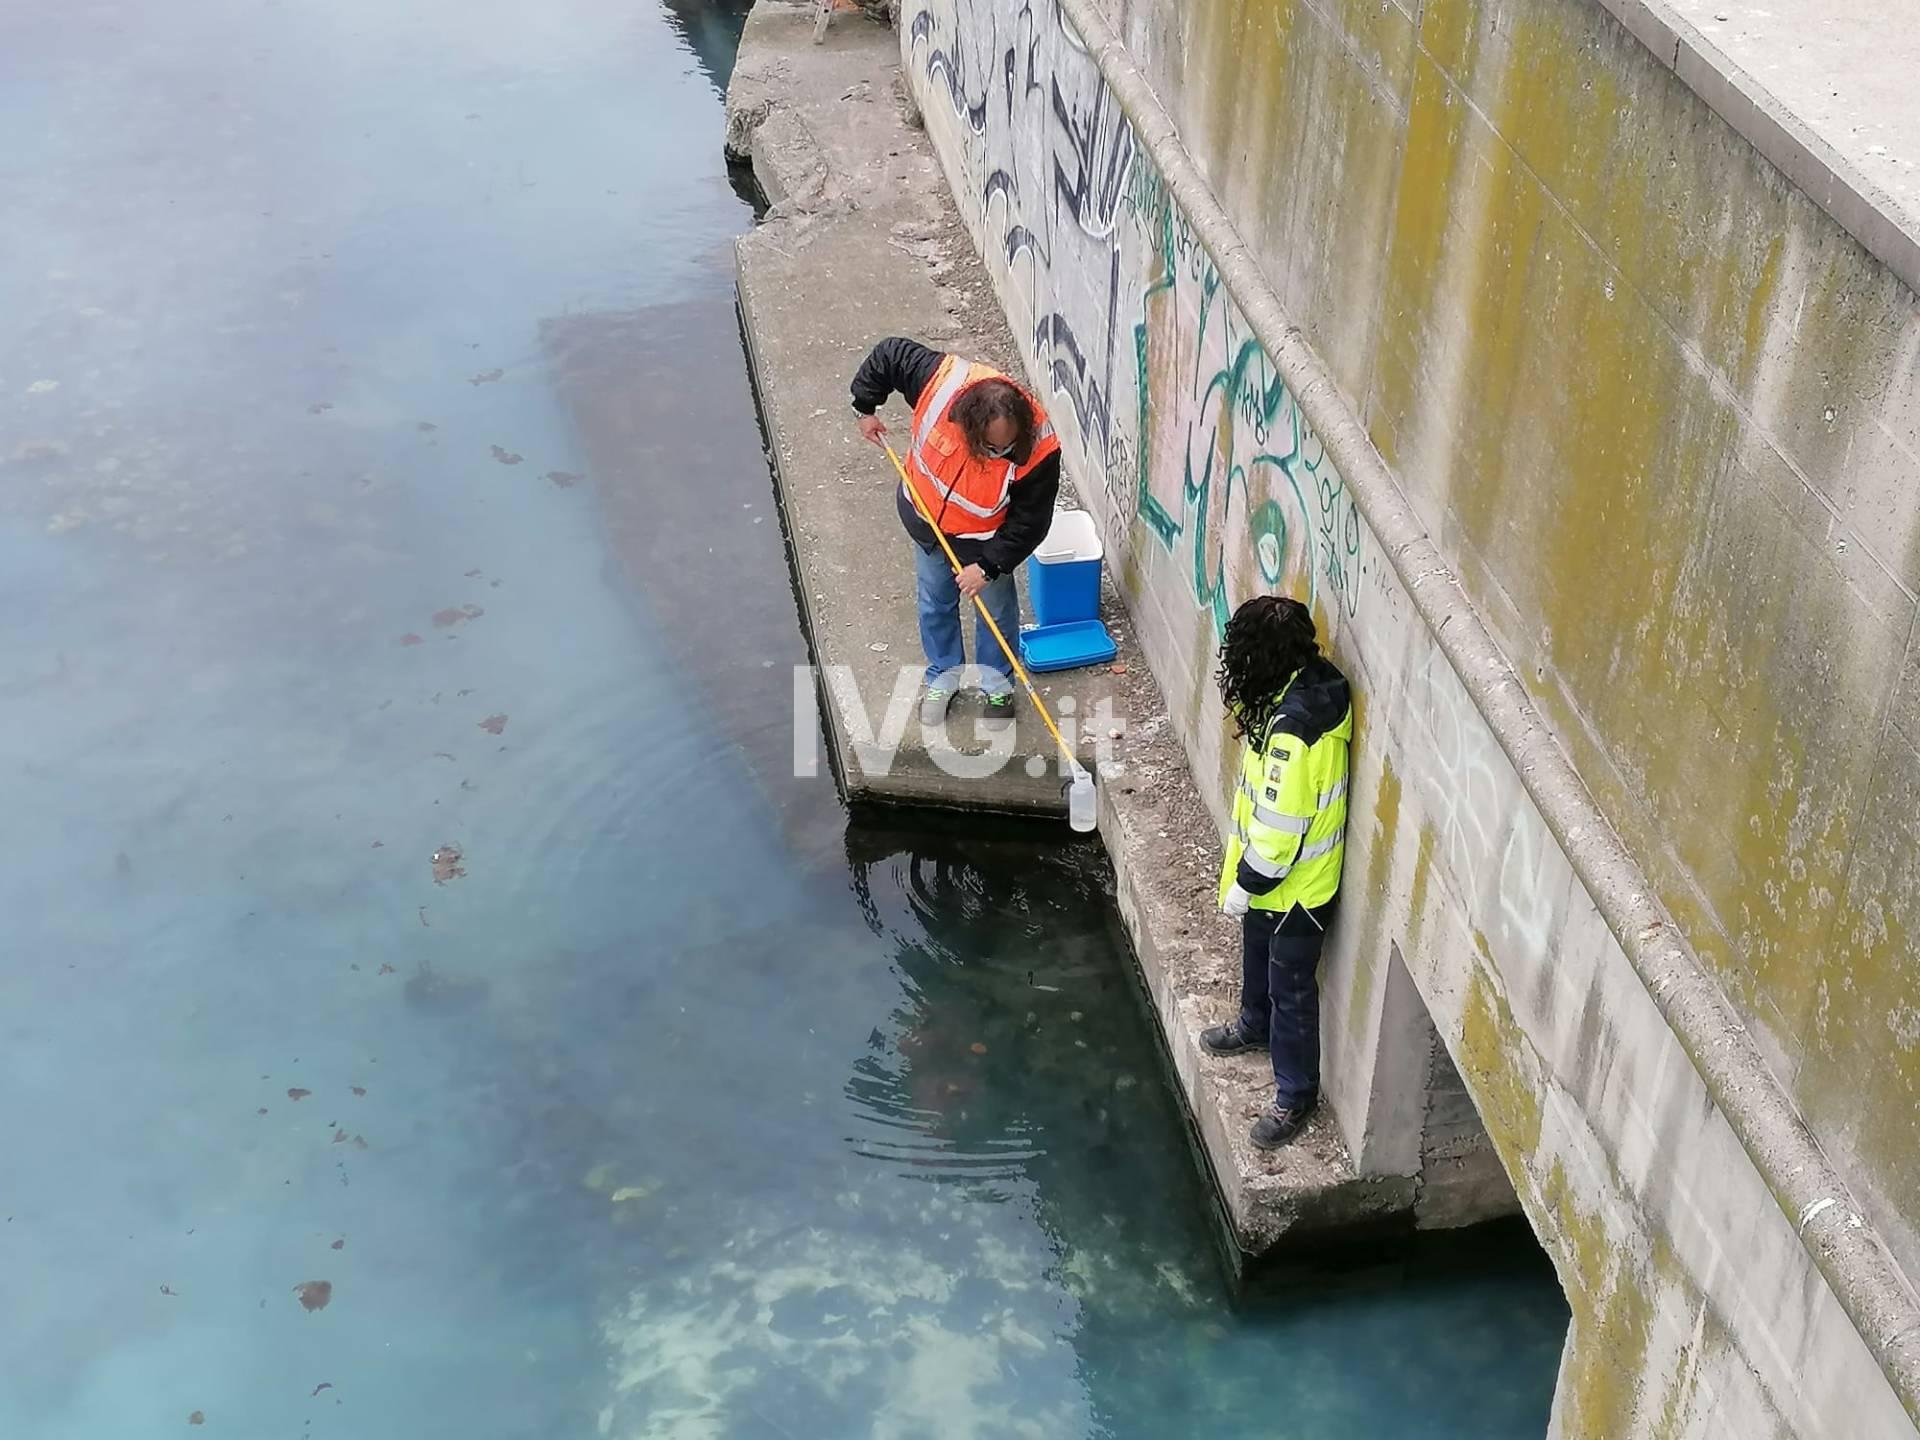 Presunto sversamento alla foce del Letimbro